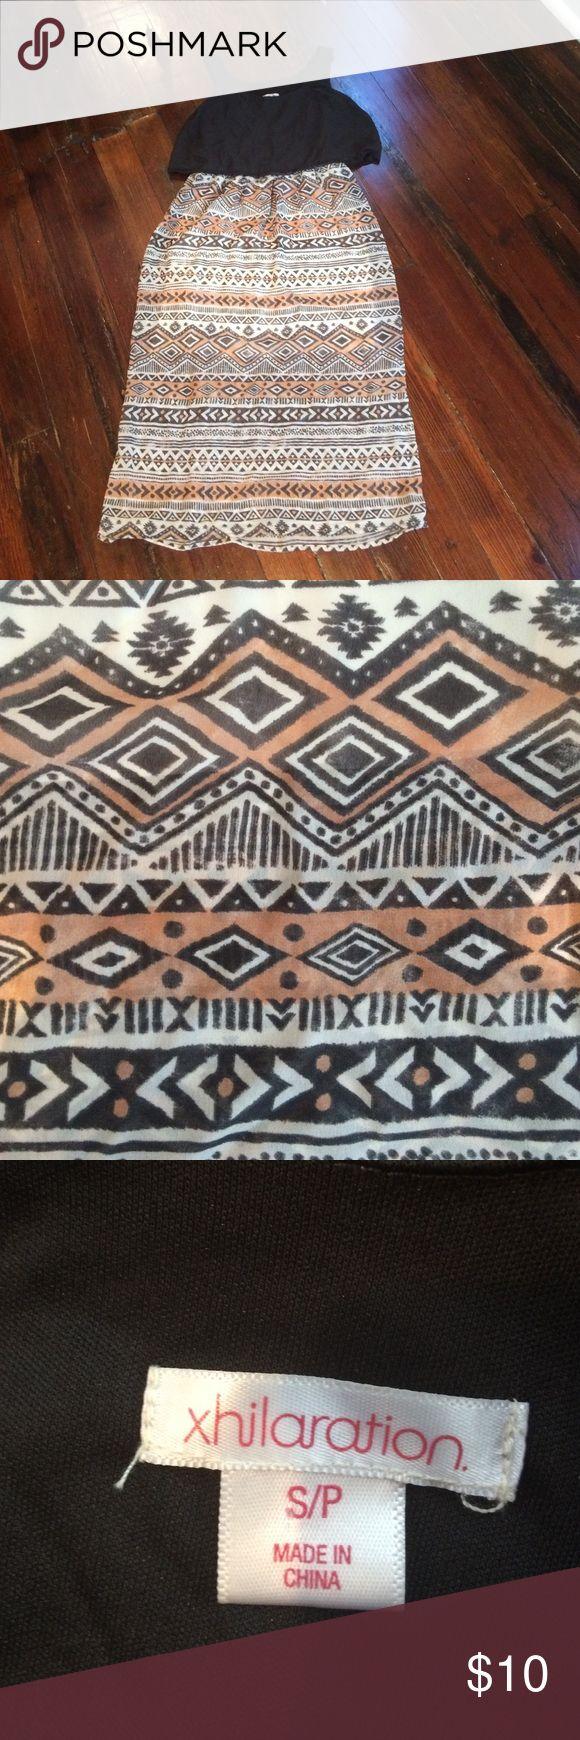 Long, Aztec-print Dress with Flowing Black Top A long dress with a black top and patterned bottom Xhilaration Dresses Maxi